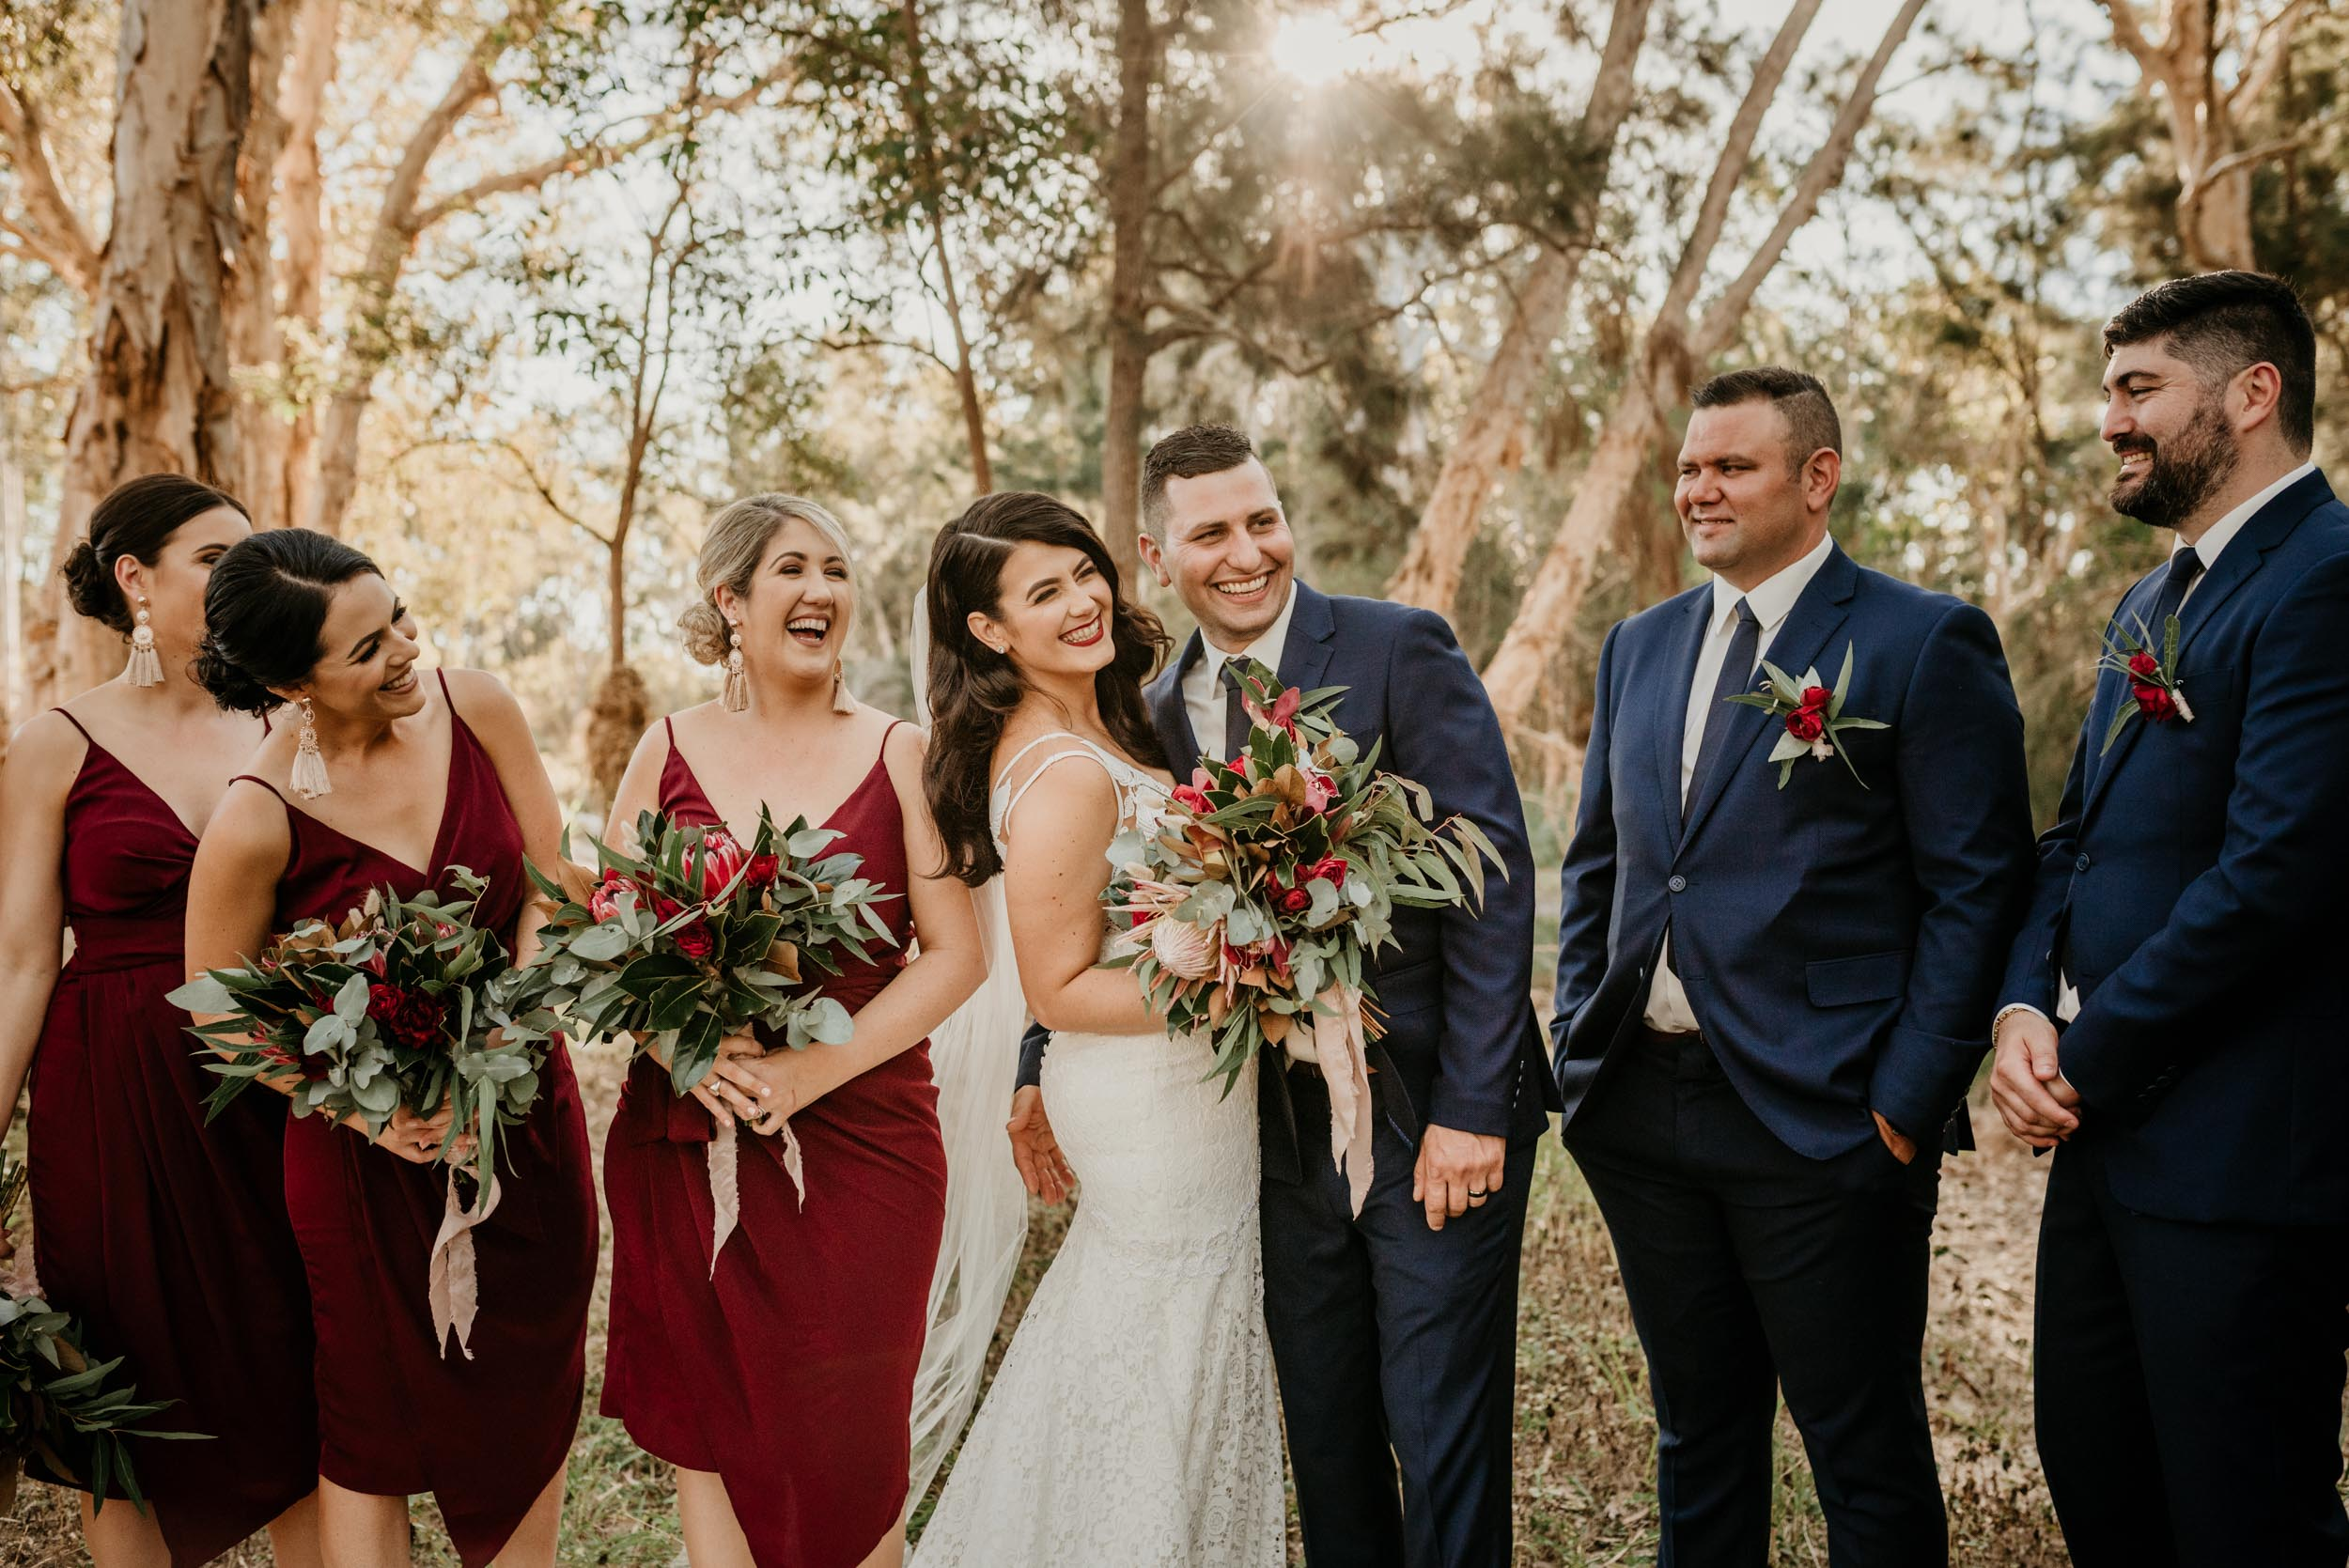 The Raw Photographer - Cairns and Port Douglas Wedding Photographer - Best of 2018-56.jpg